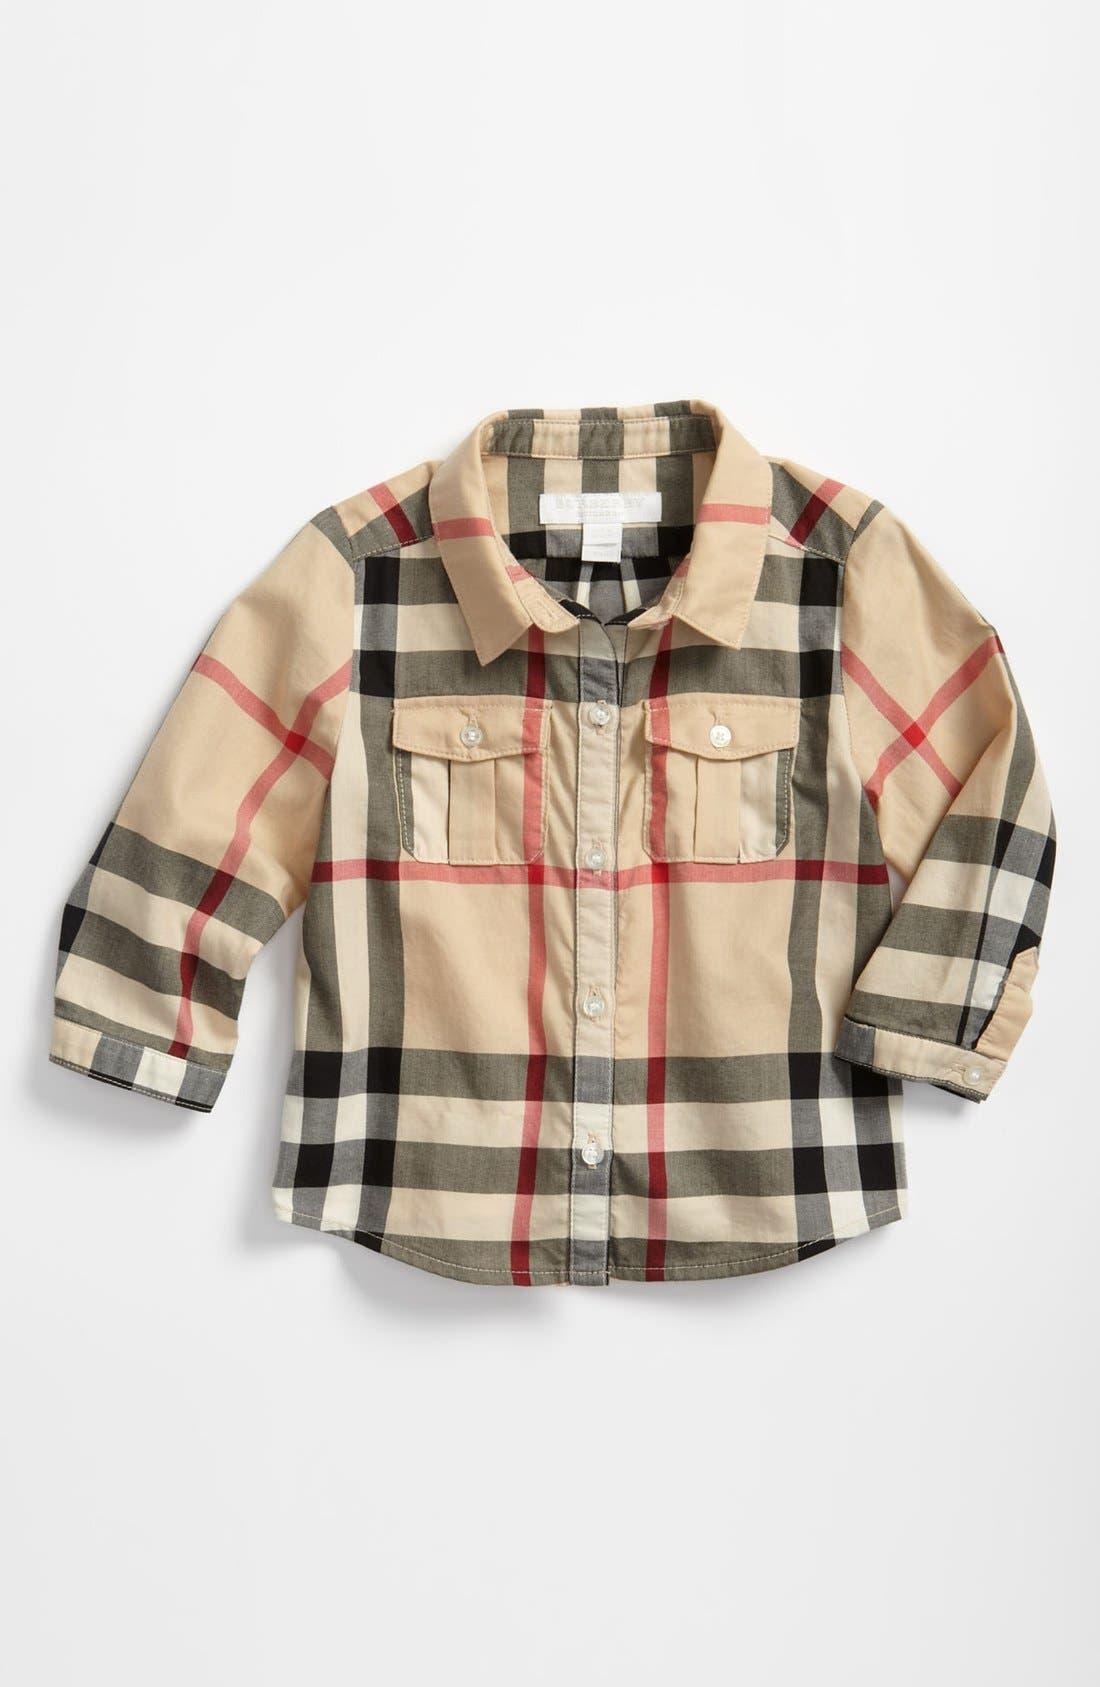 Alternate Image 1 Selected - Burberry Check Print Shirt (Toddler Boys)